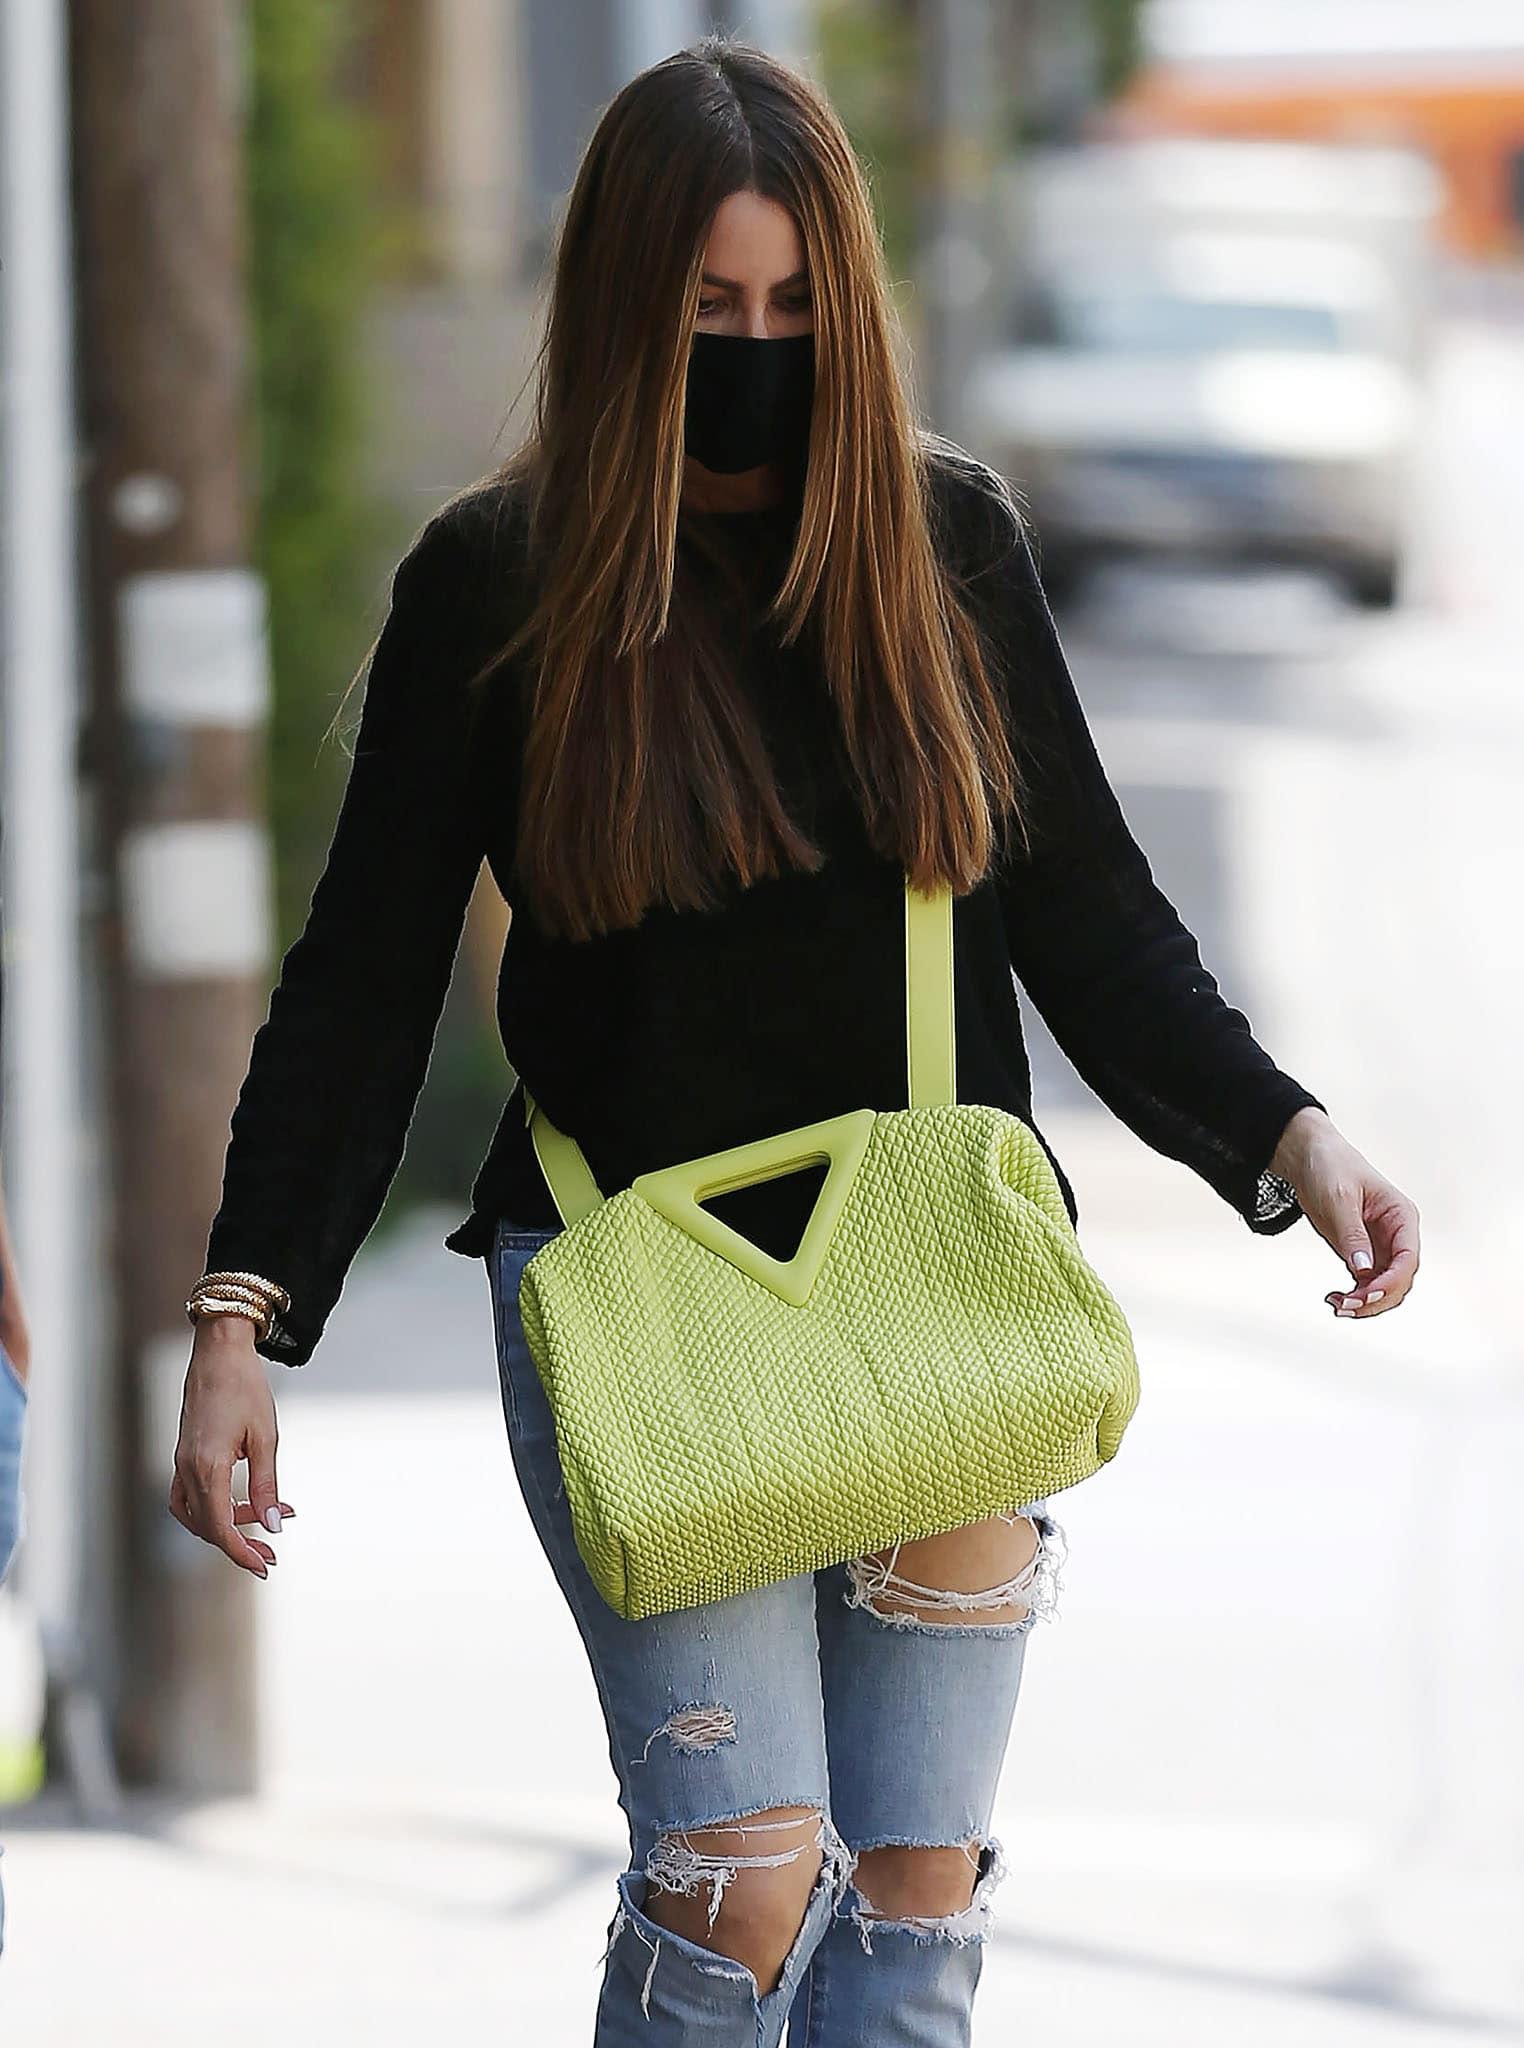 Sofia Vergara carries a seagrass Bottega Veneta Point bag across her body